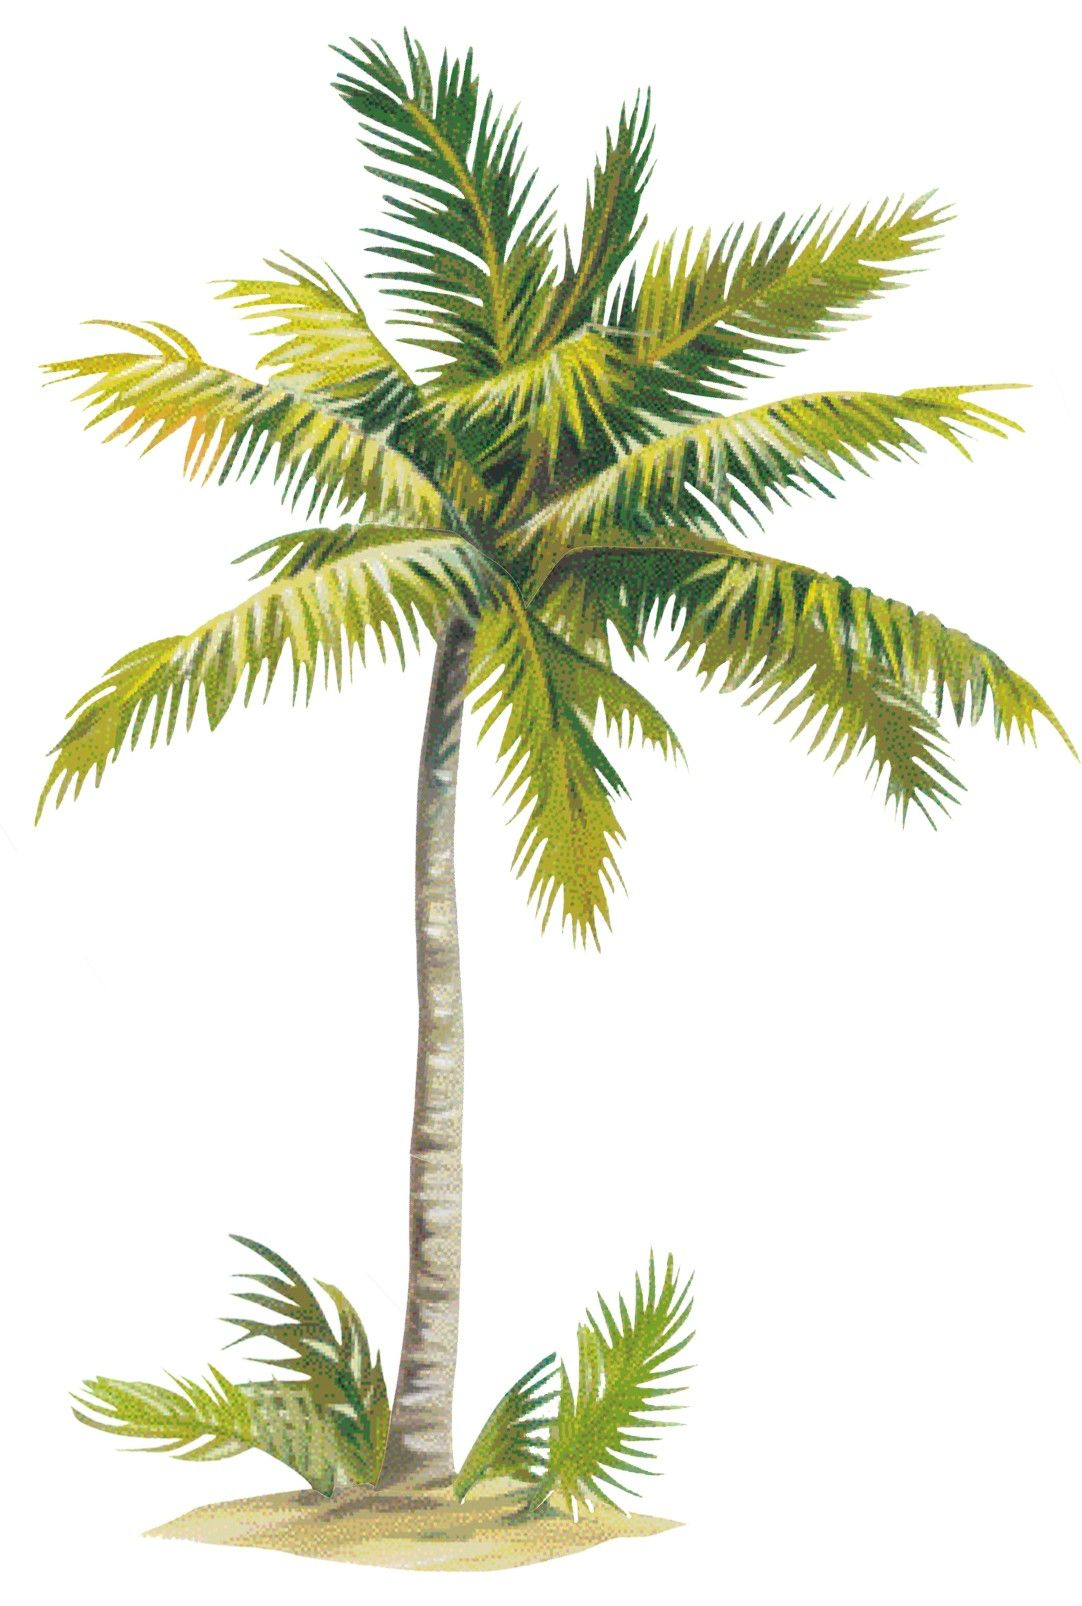 Pin By Reham Nagy On Projet Developpement Visuel Palm Trees Painting Tree Art Beach Art Painting